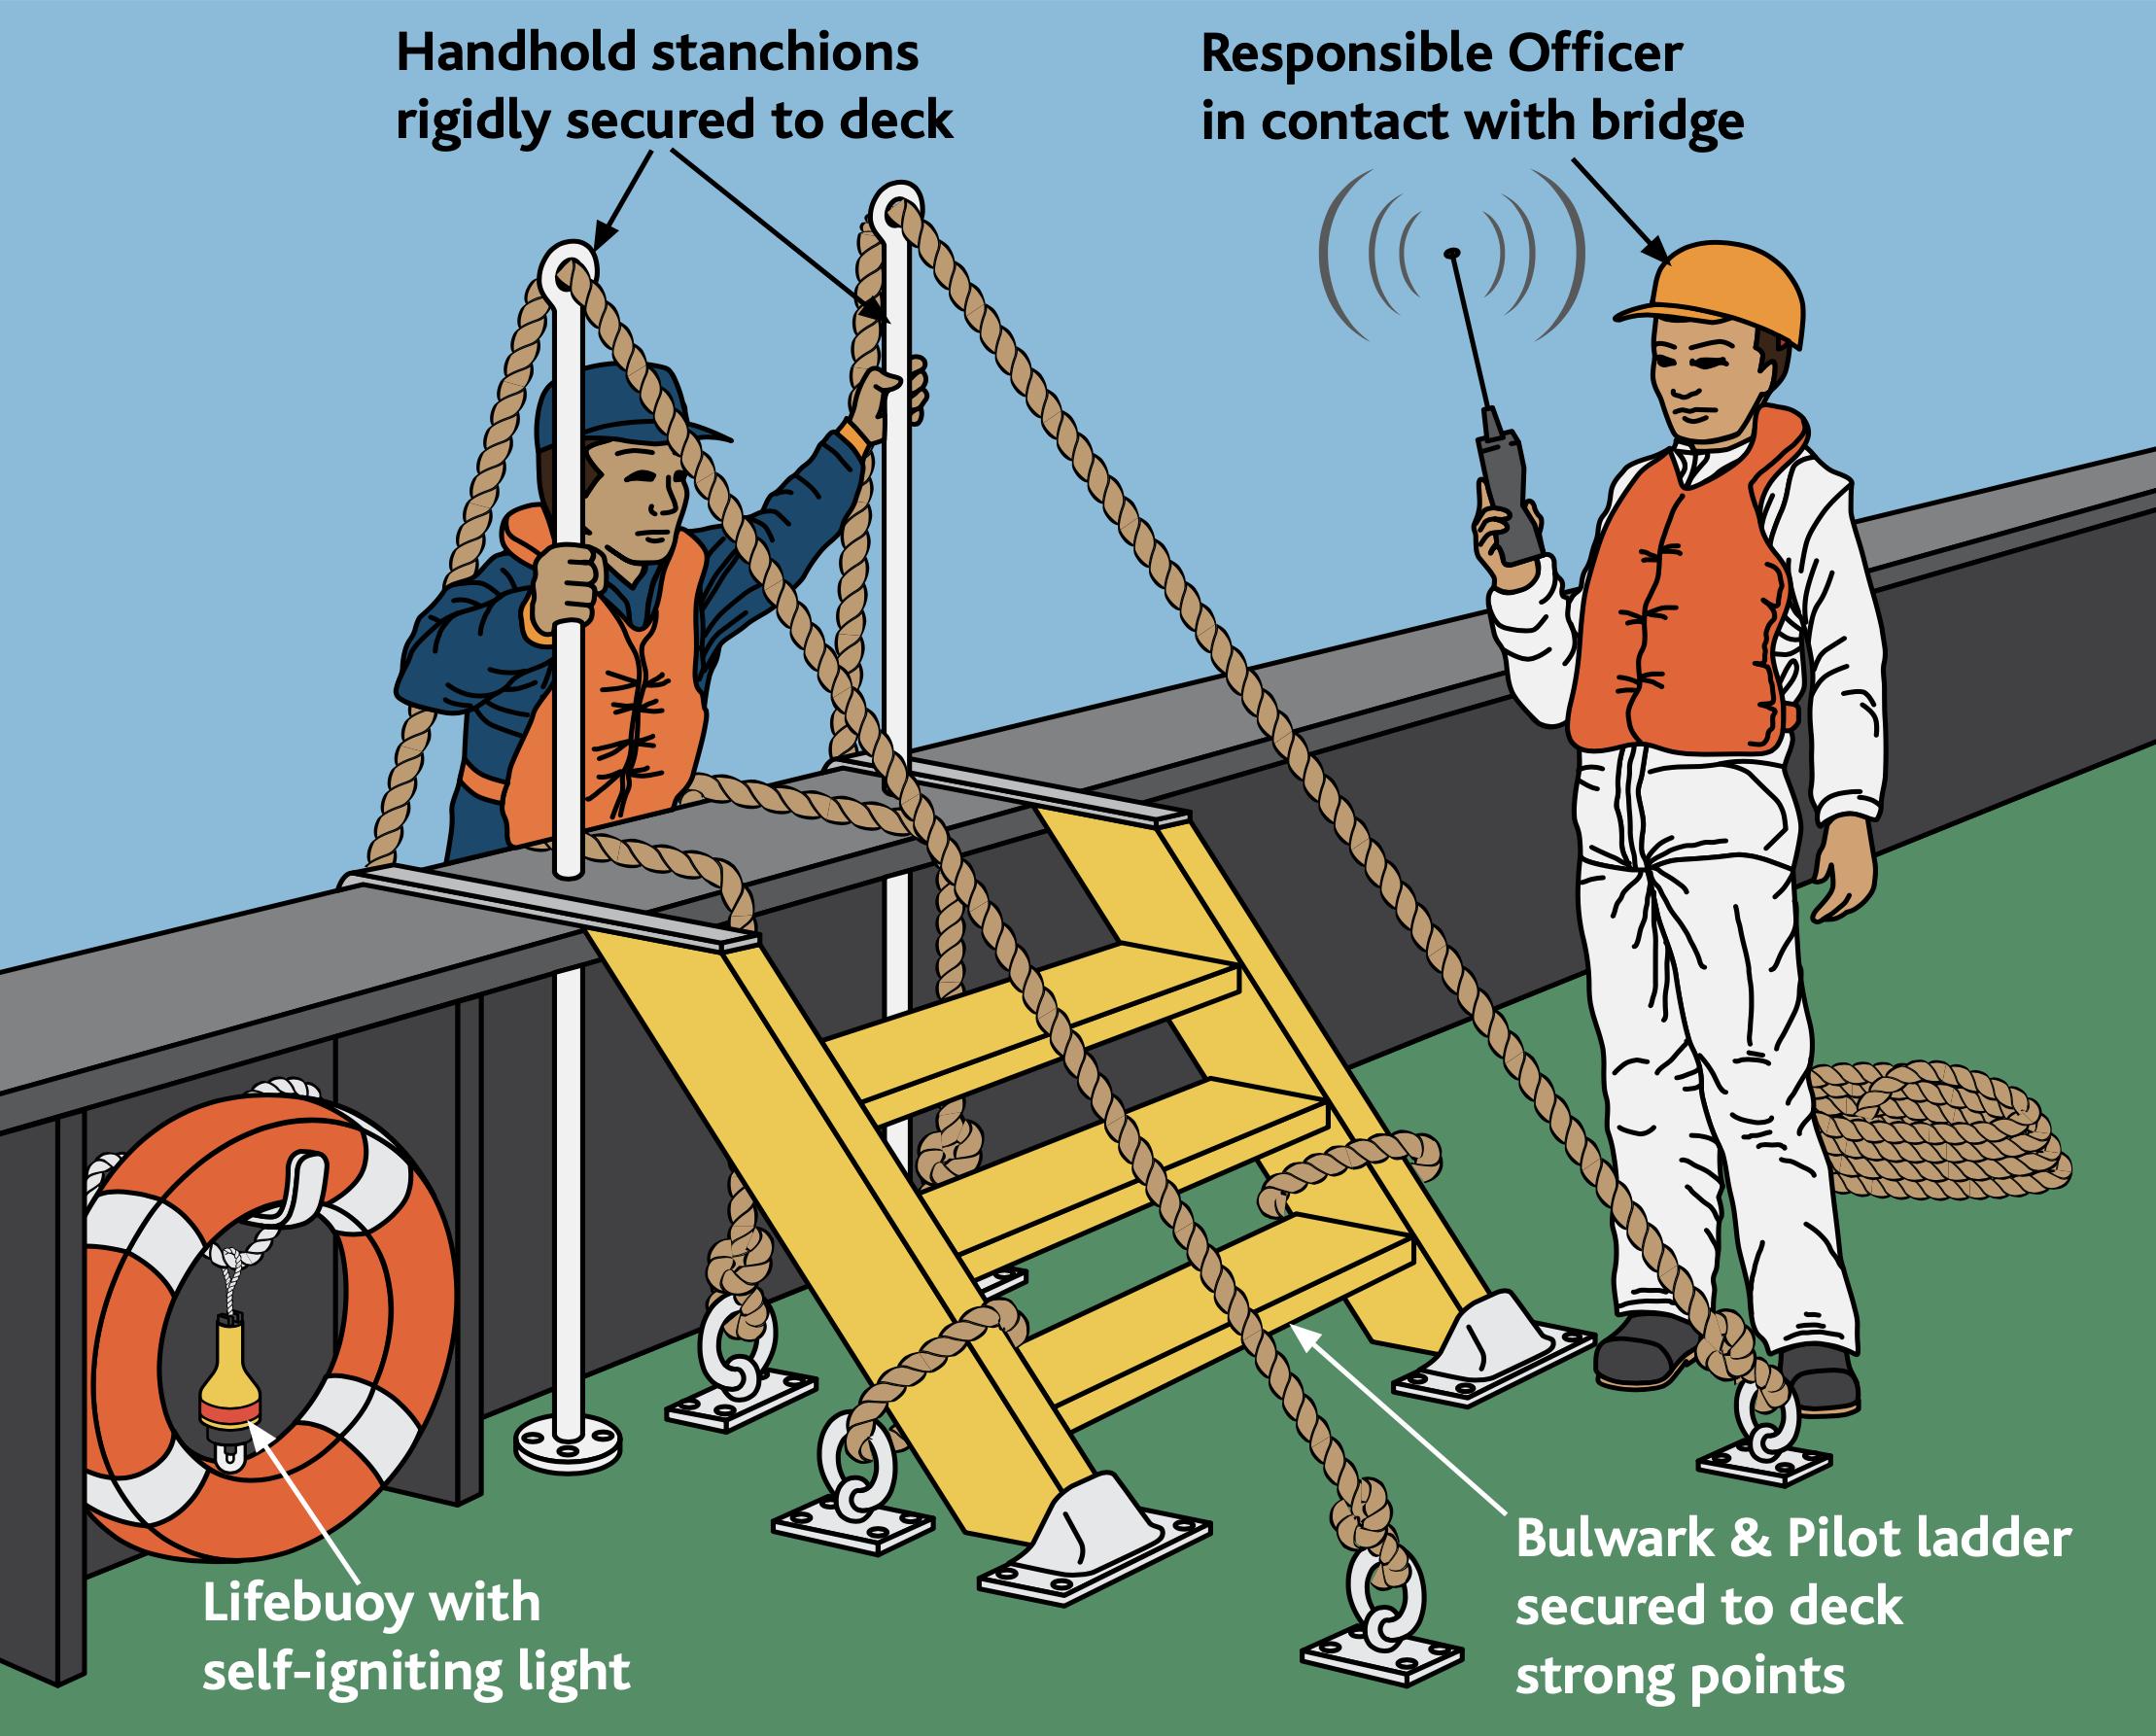 Access to Deck (Wheelhouse poster)